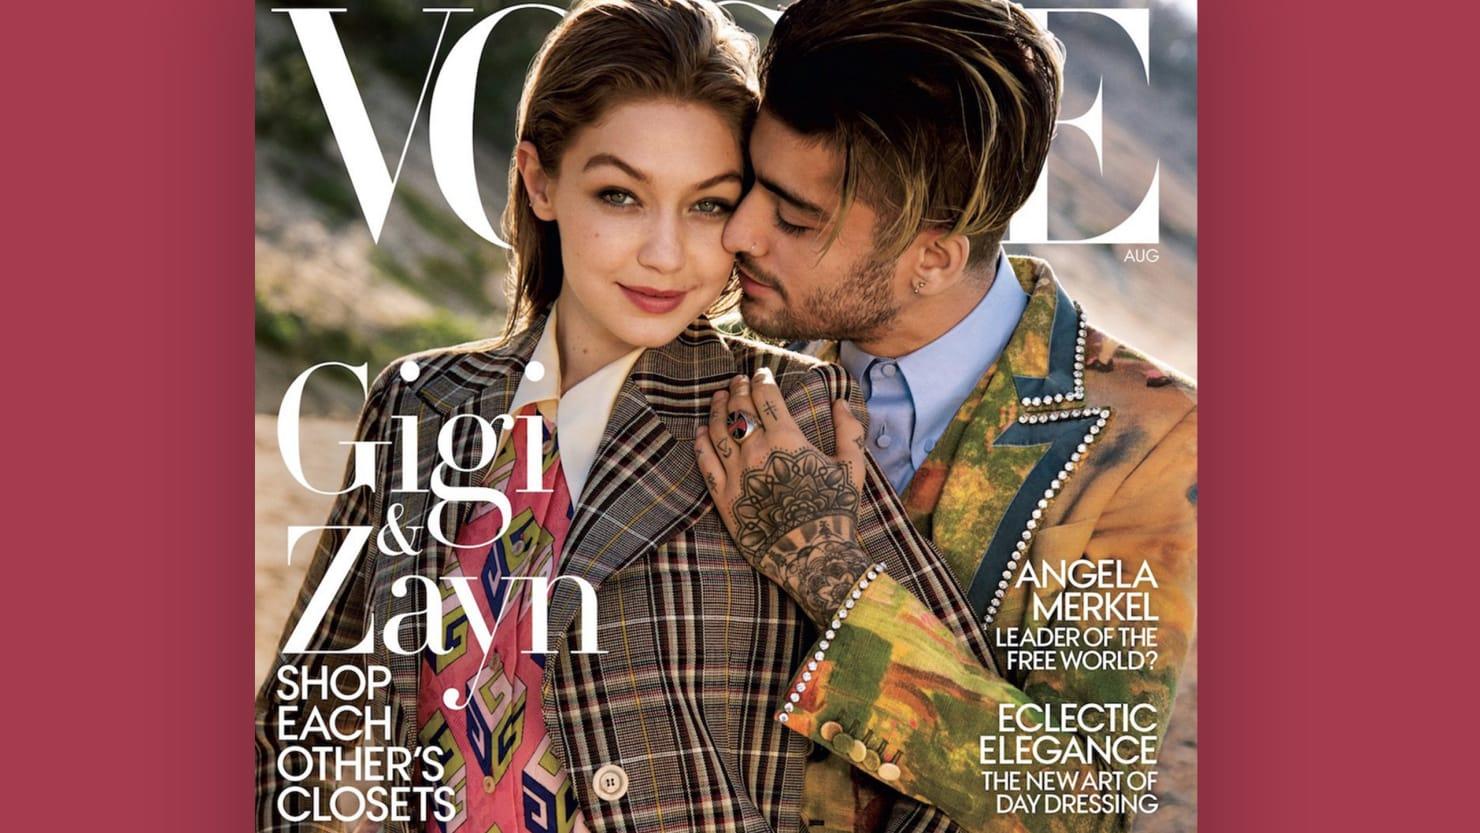 'Vogue' Apologizes for Tone-Deaf Gigi Hadid and Zayn Malik 'Gender Fluidity' Cover